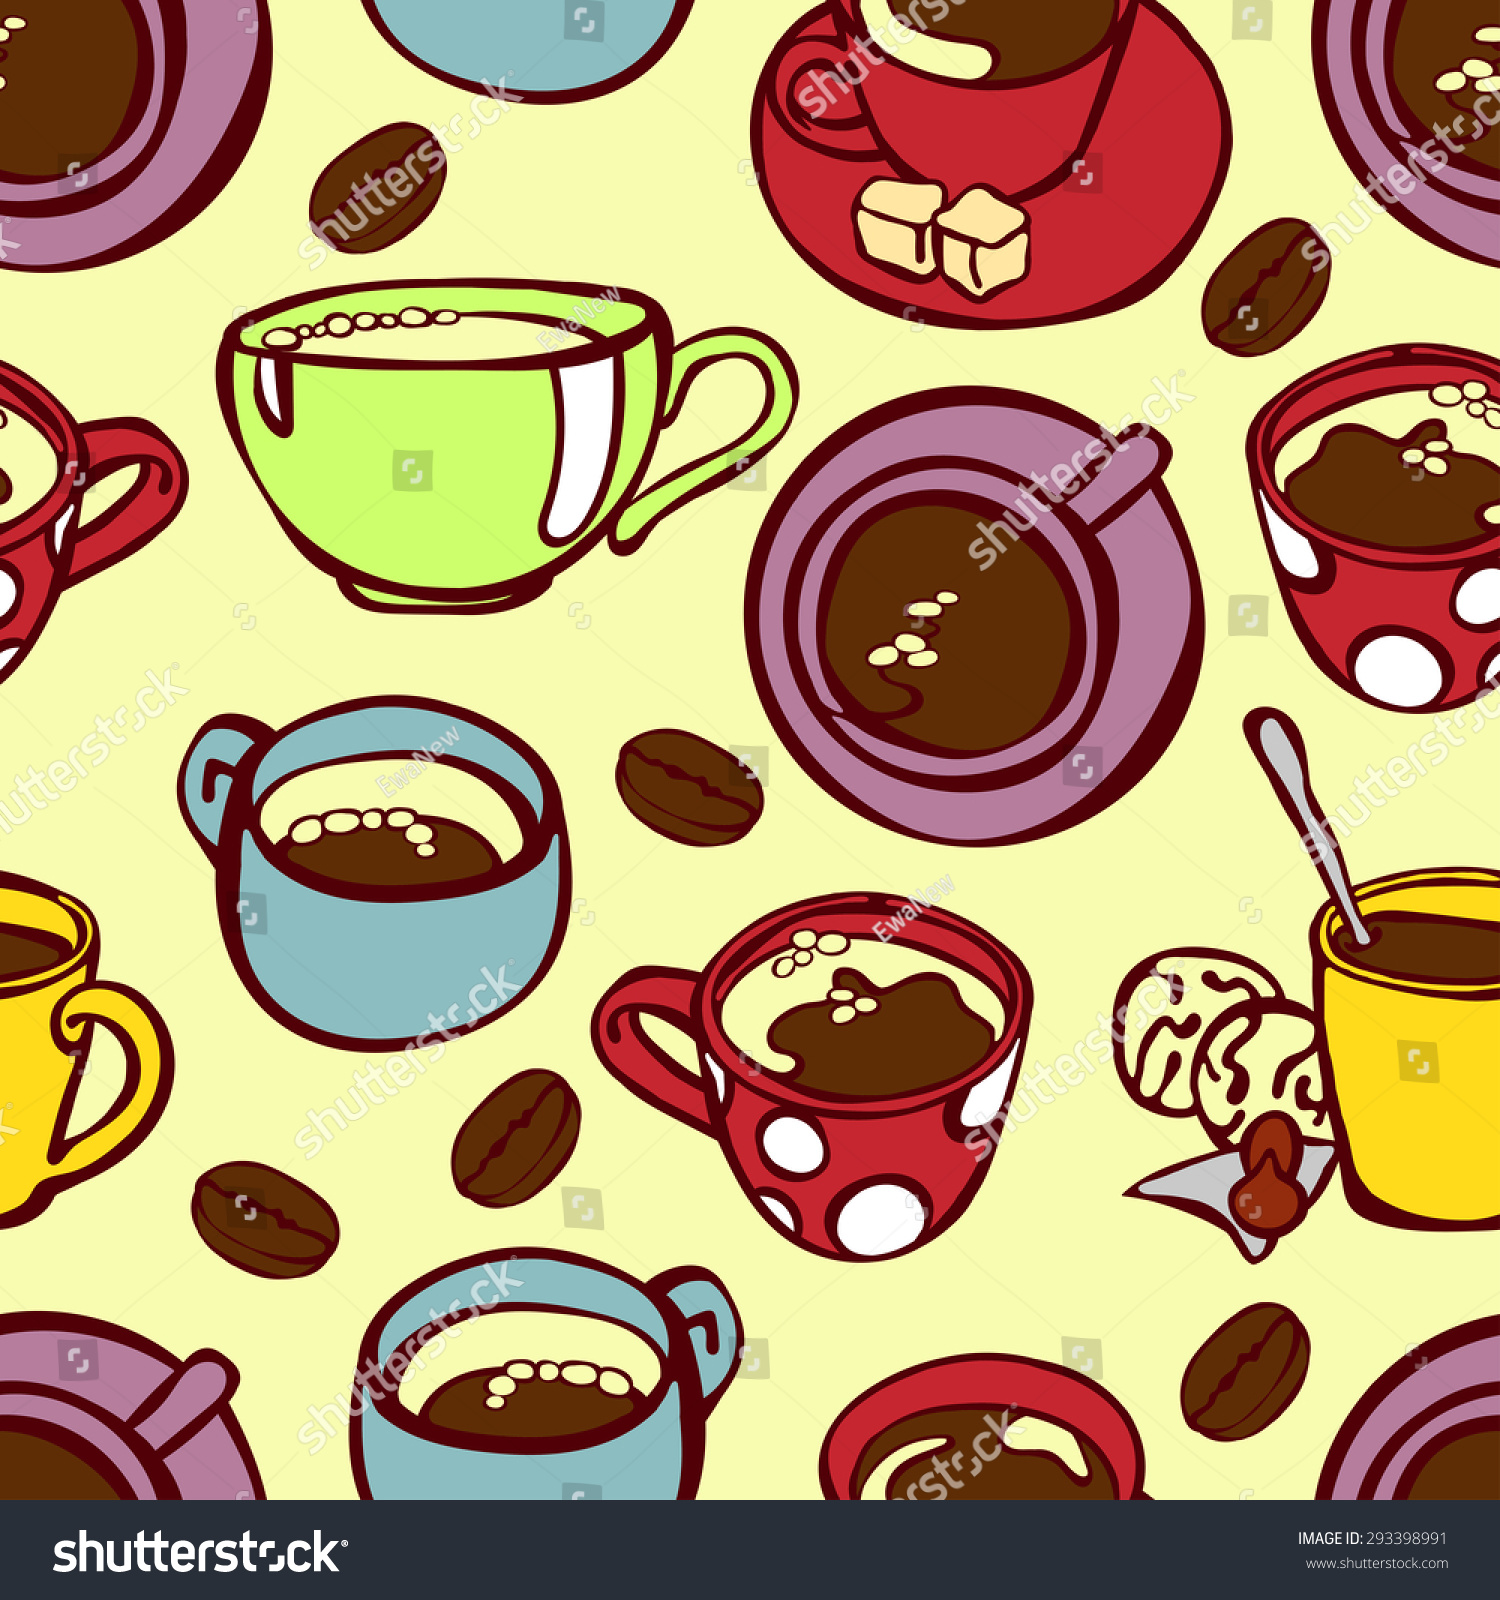 Set Cute Cups Mugs Coffee Mug Stock Vector Royalty Free 293398991